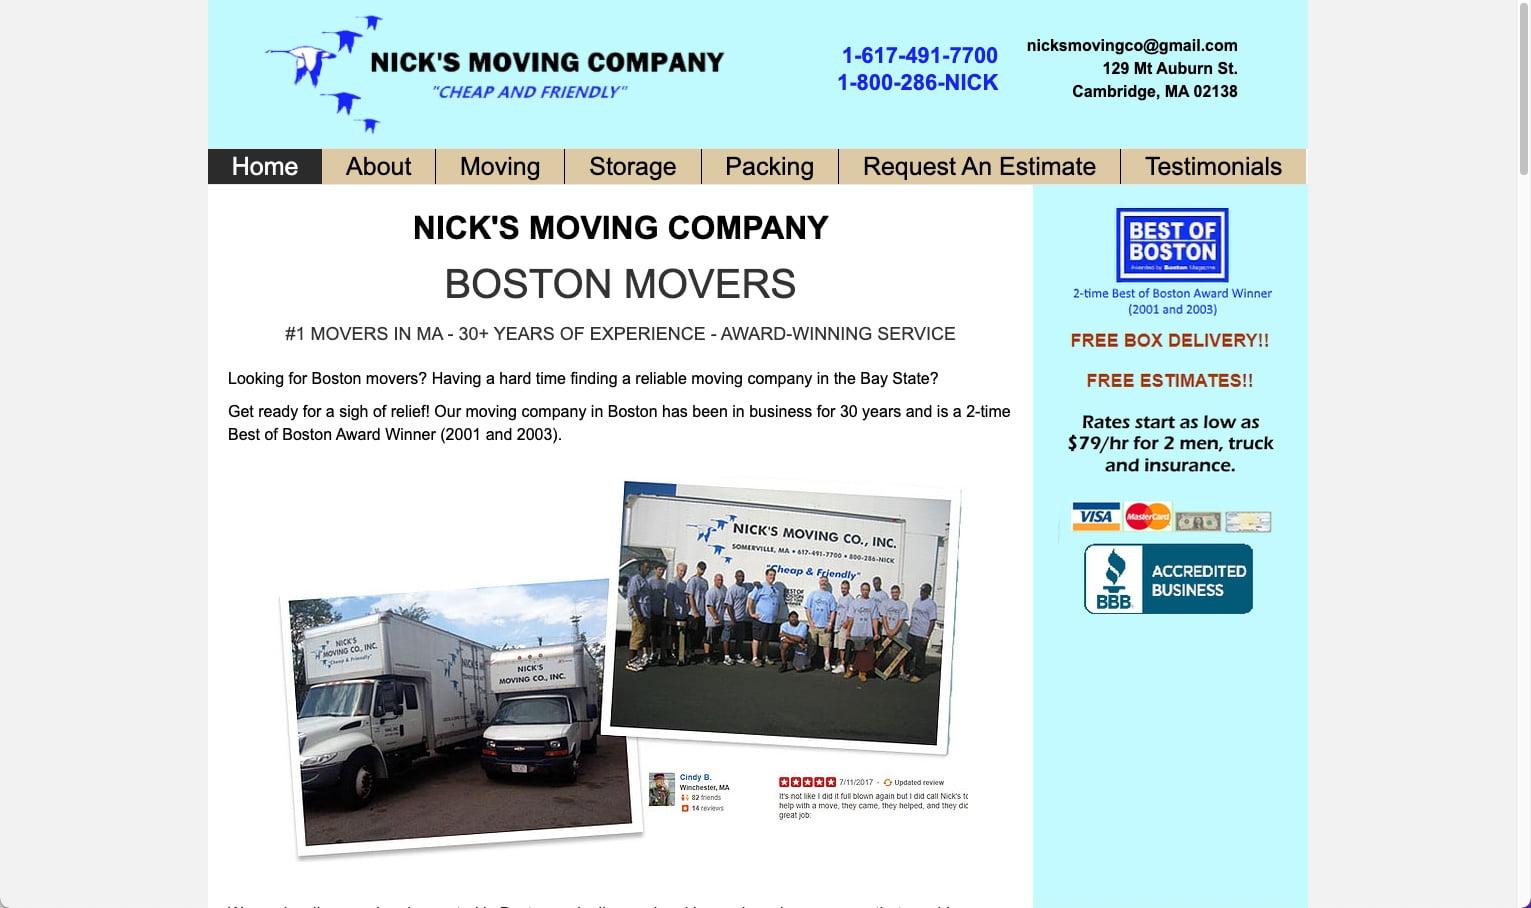 Nick's Moving Company